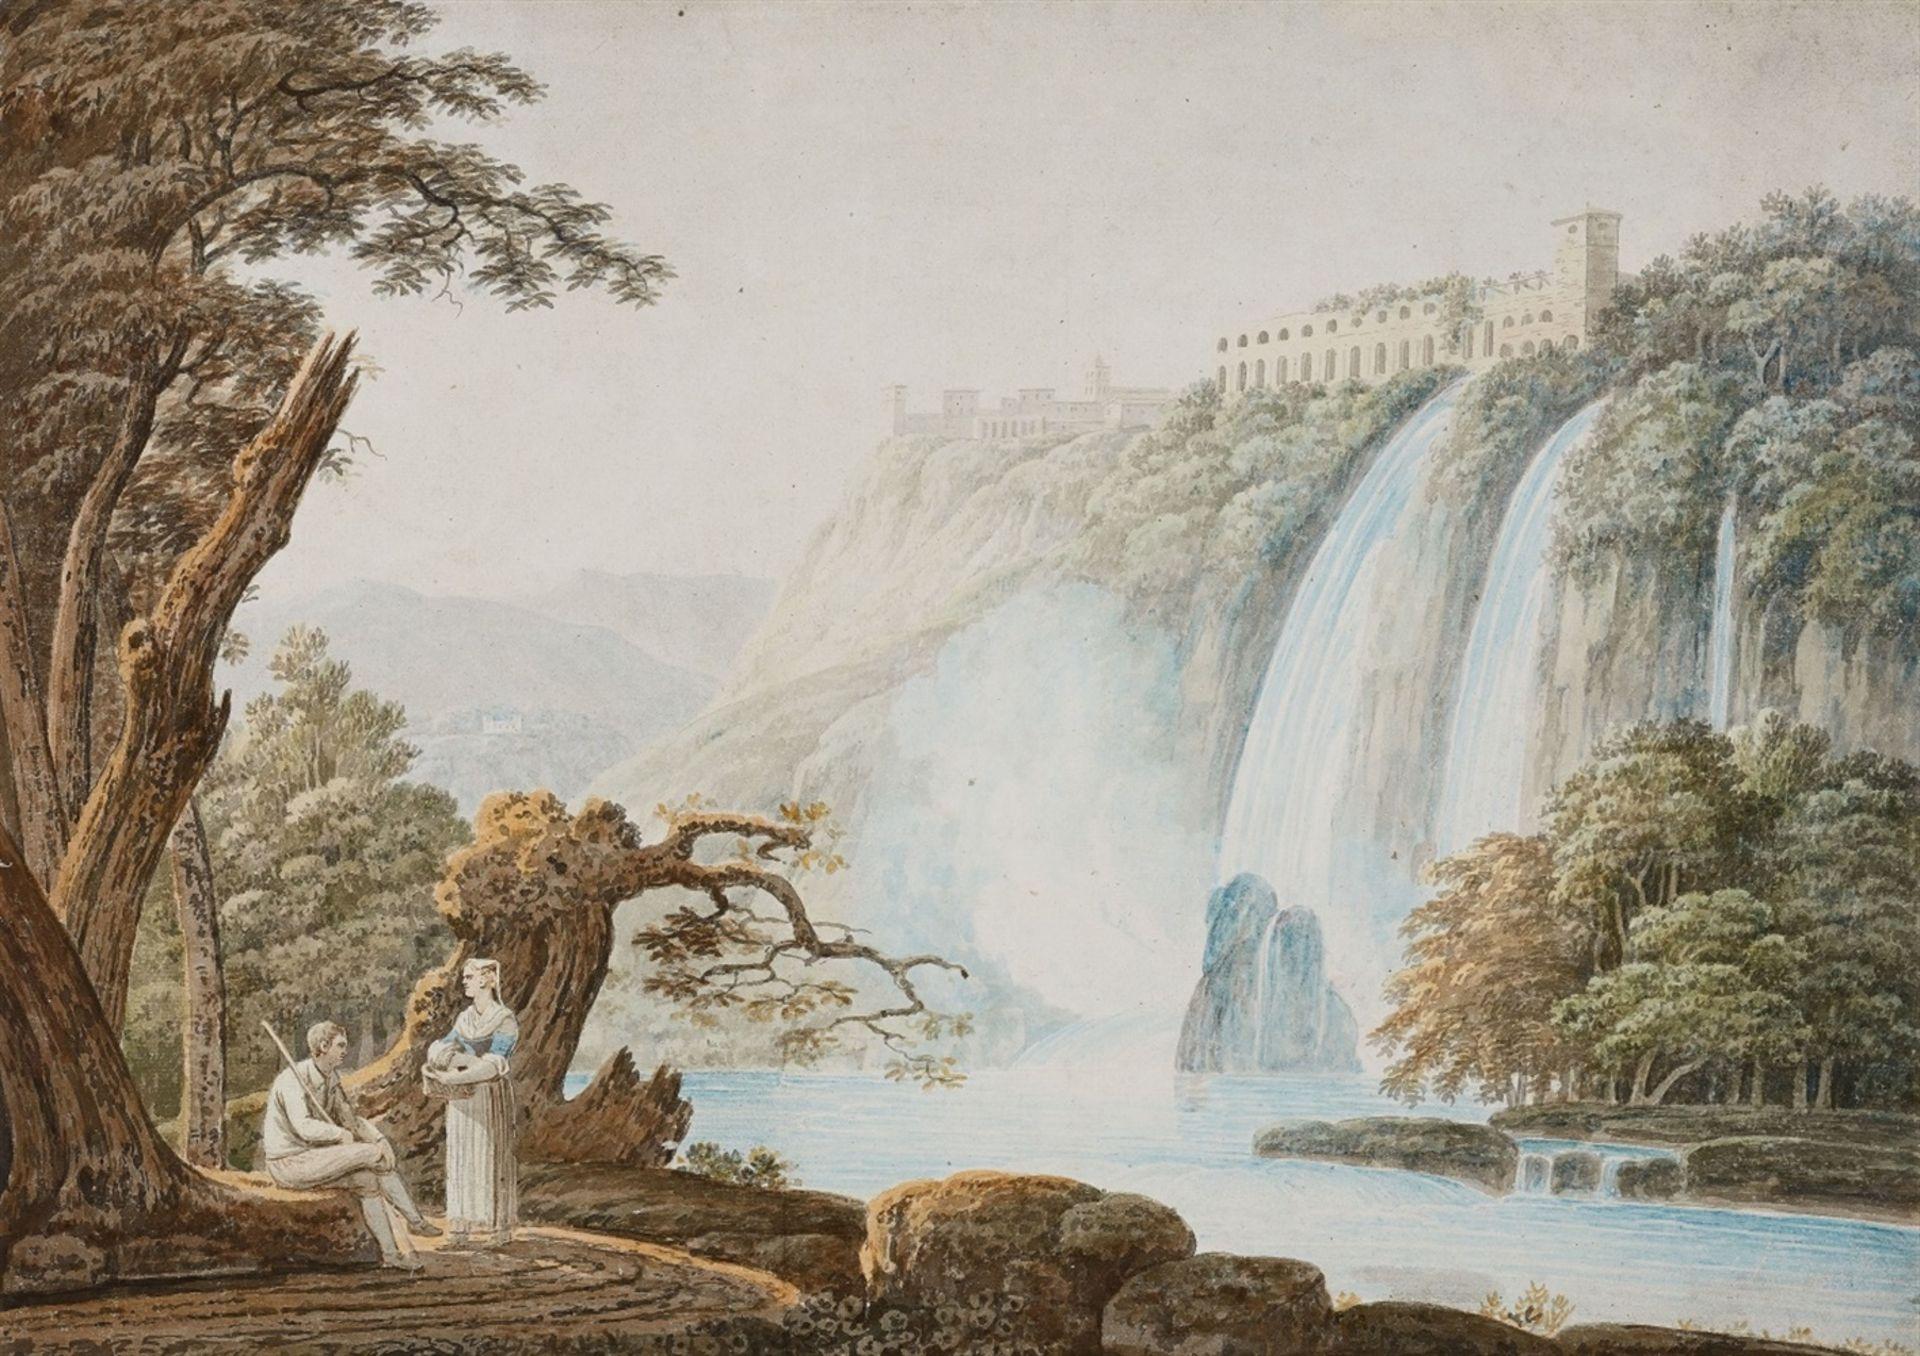 Los 2501 - Jacob MoreThe Villa of Maecenas and the Waterfalls at TivoliWatercolour on paper. 50.5 x 71 cm.